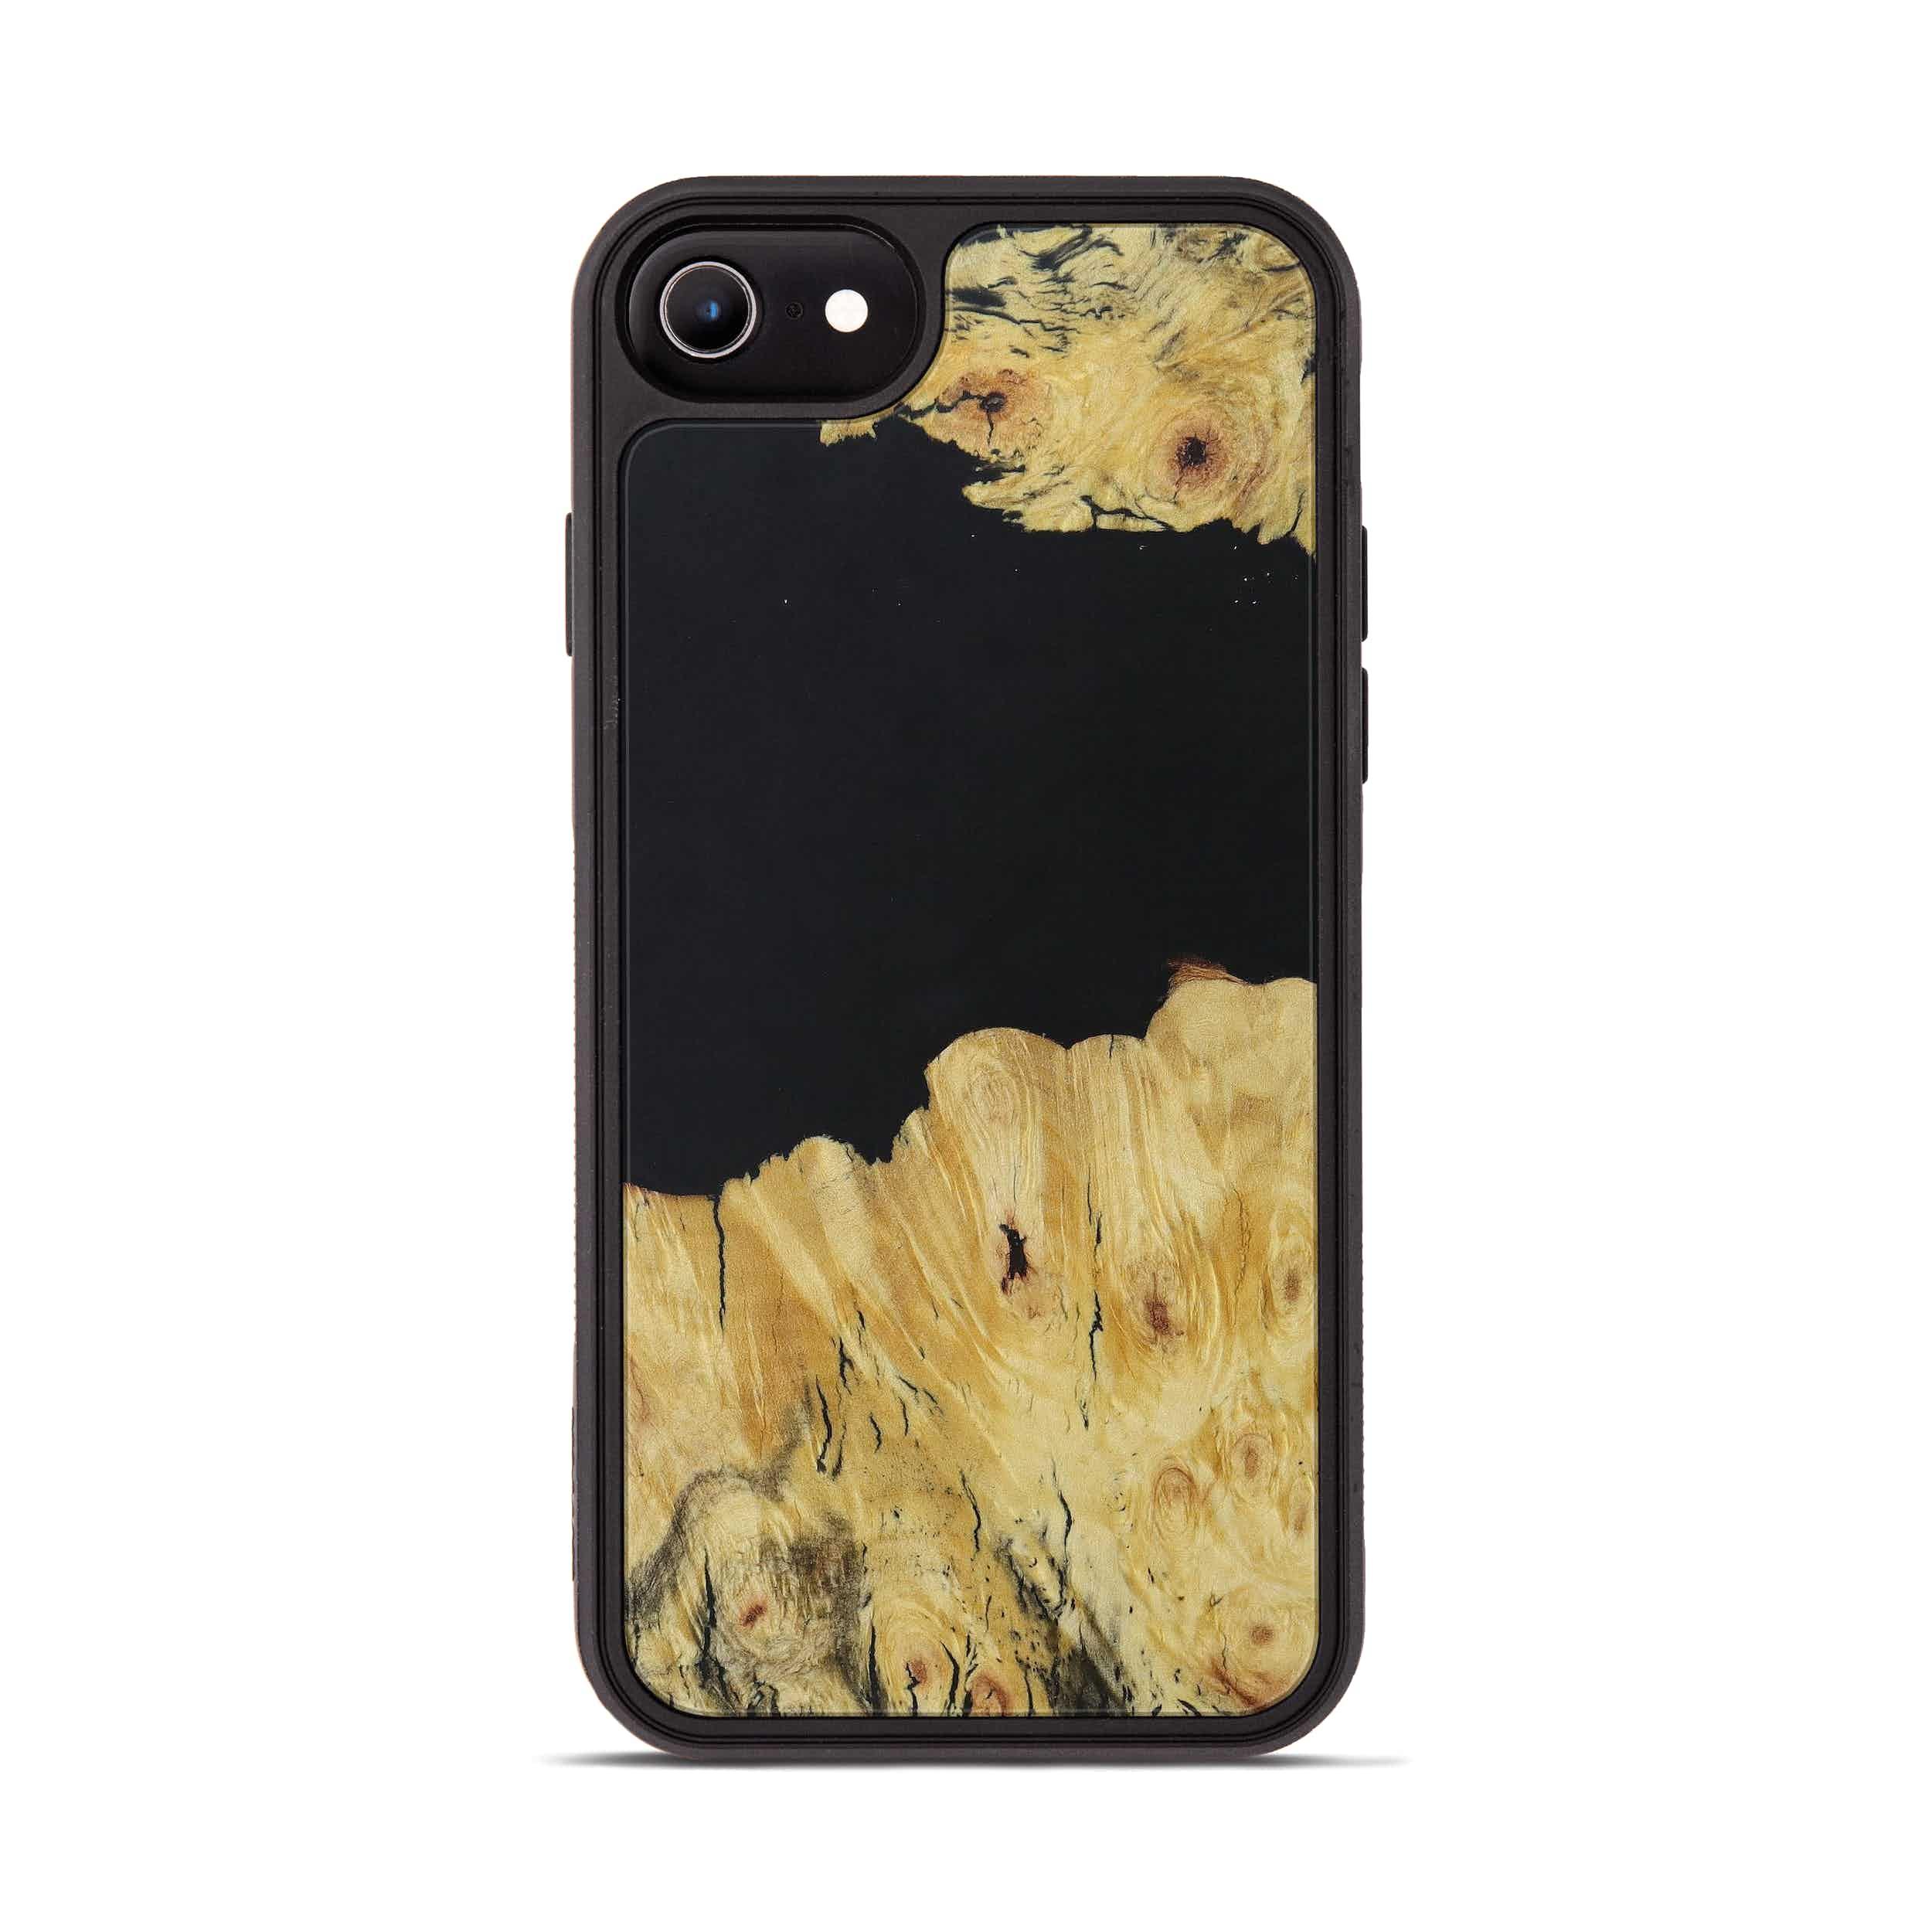 iPhone 6s Wood+Resin Phone Case - Darelle (Pure Black, 395155)